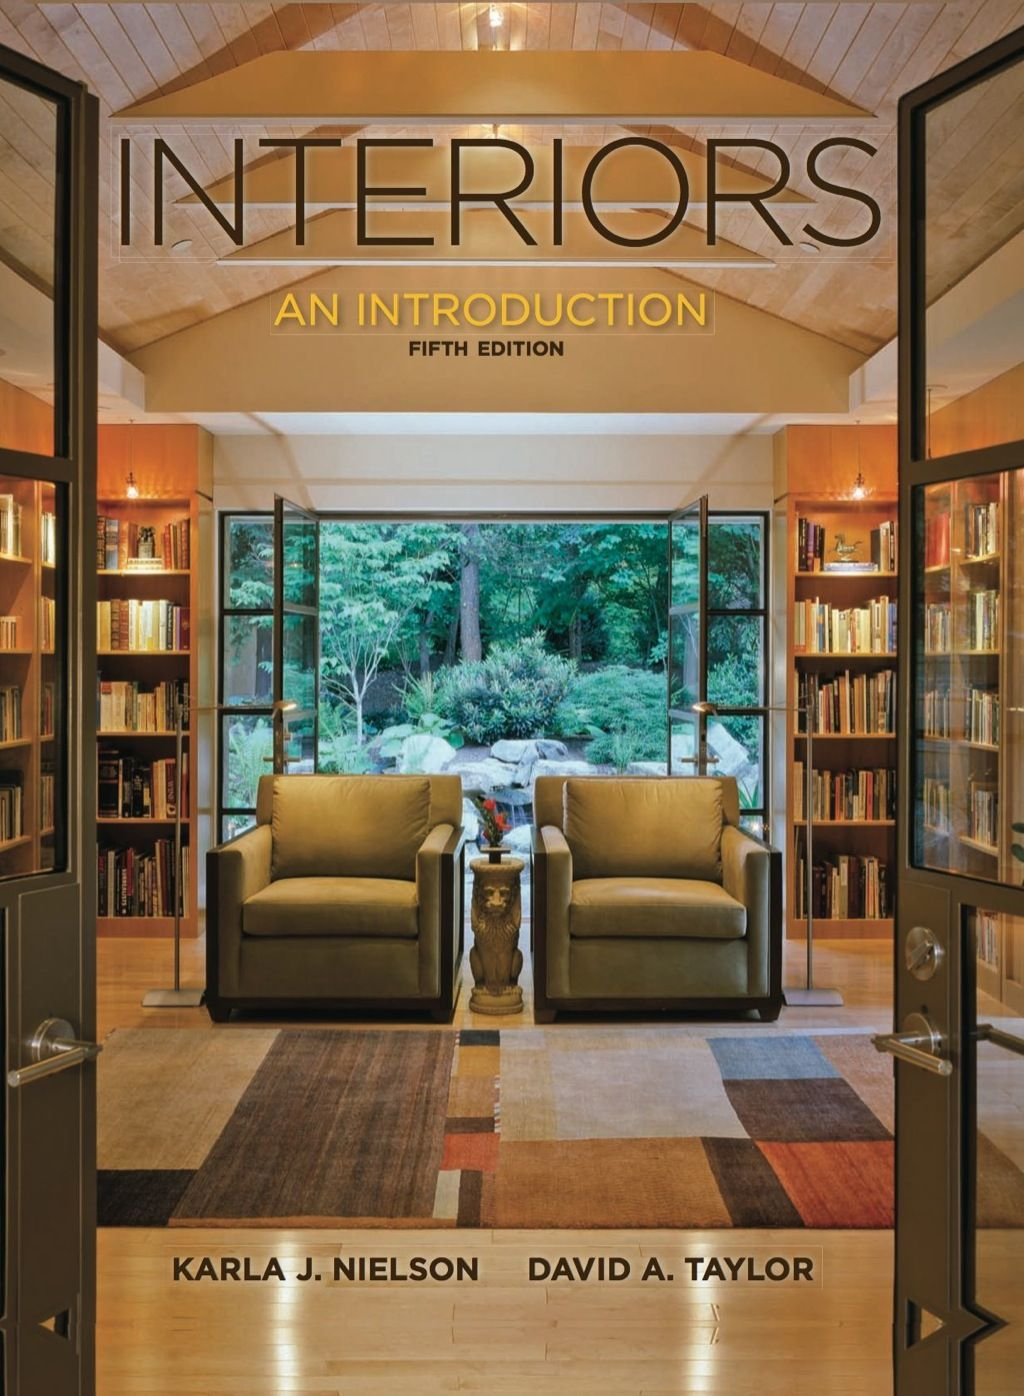 Interiors Ebook Rental In 2020 Interior House Home Magazine Design